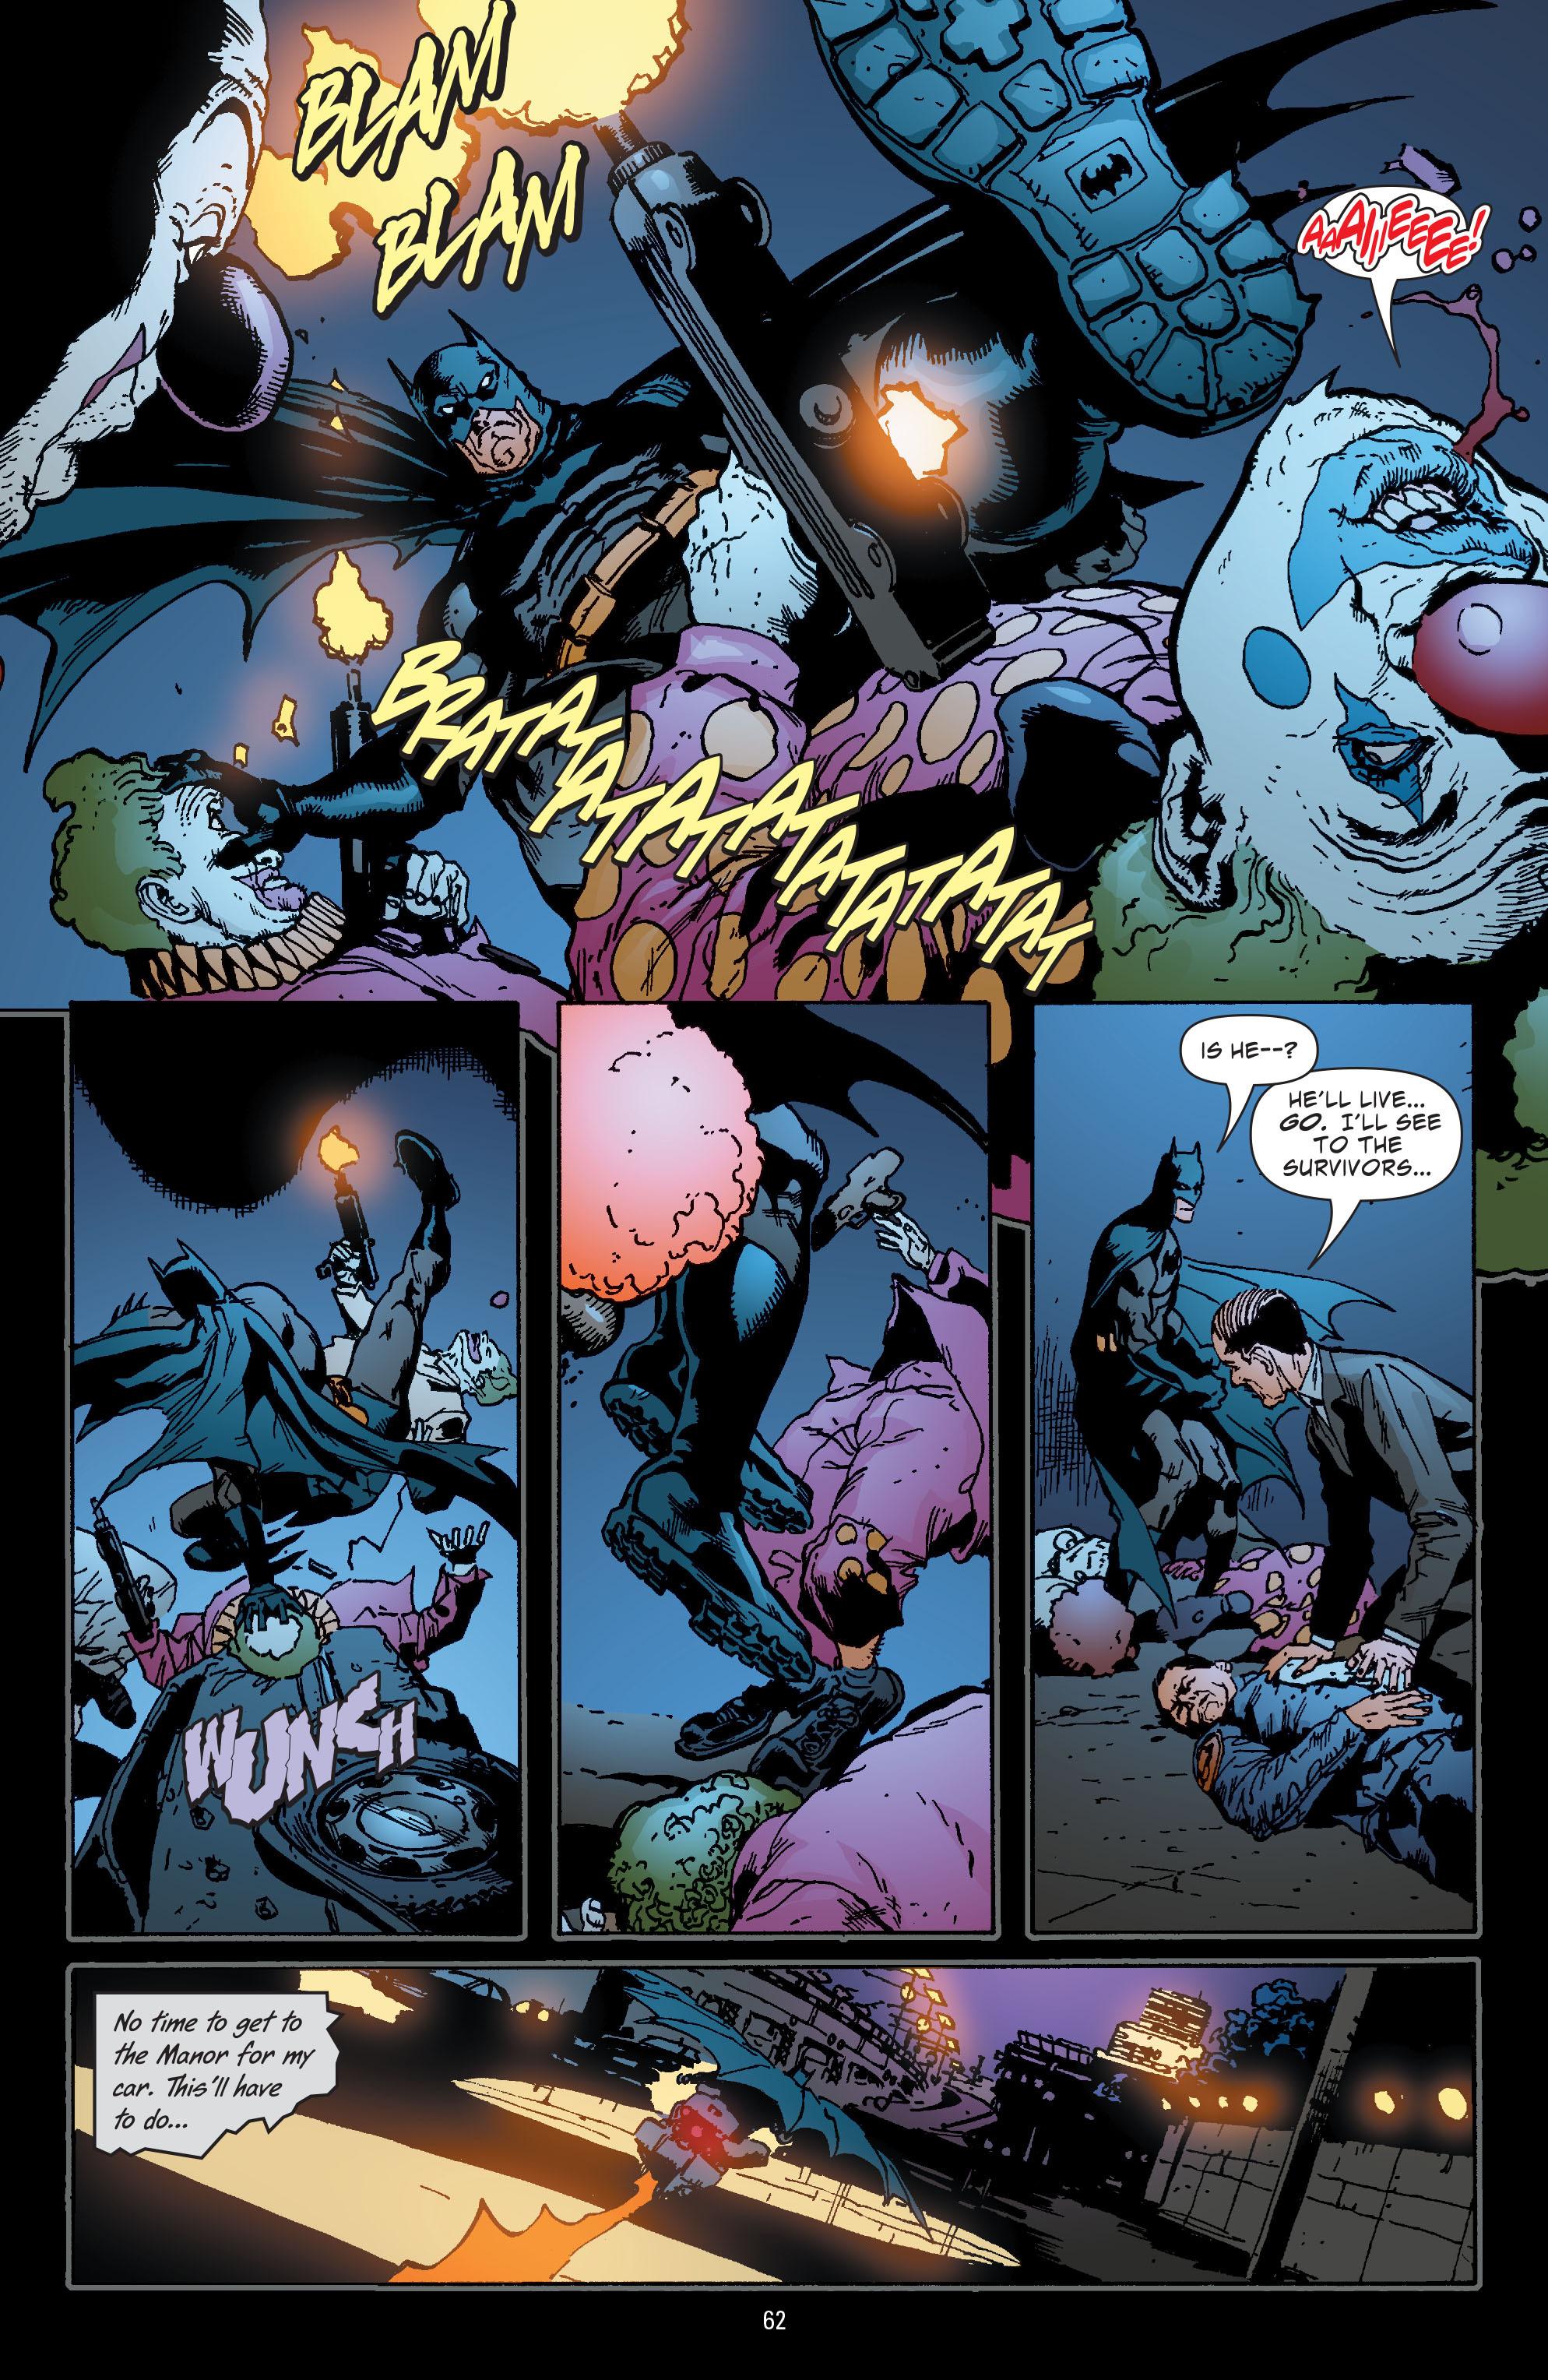 Batman: The Man Who Laughs chap 1 pic 63